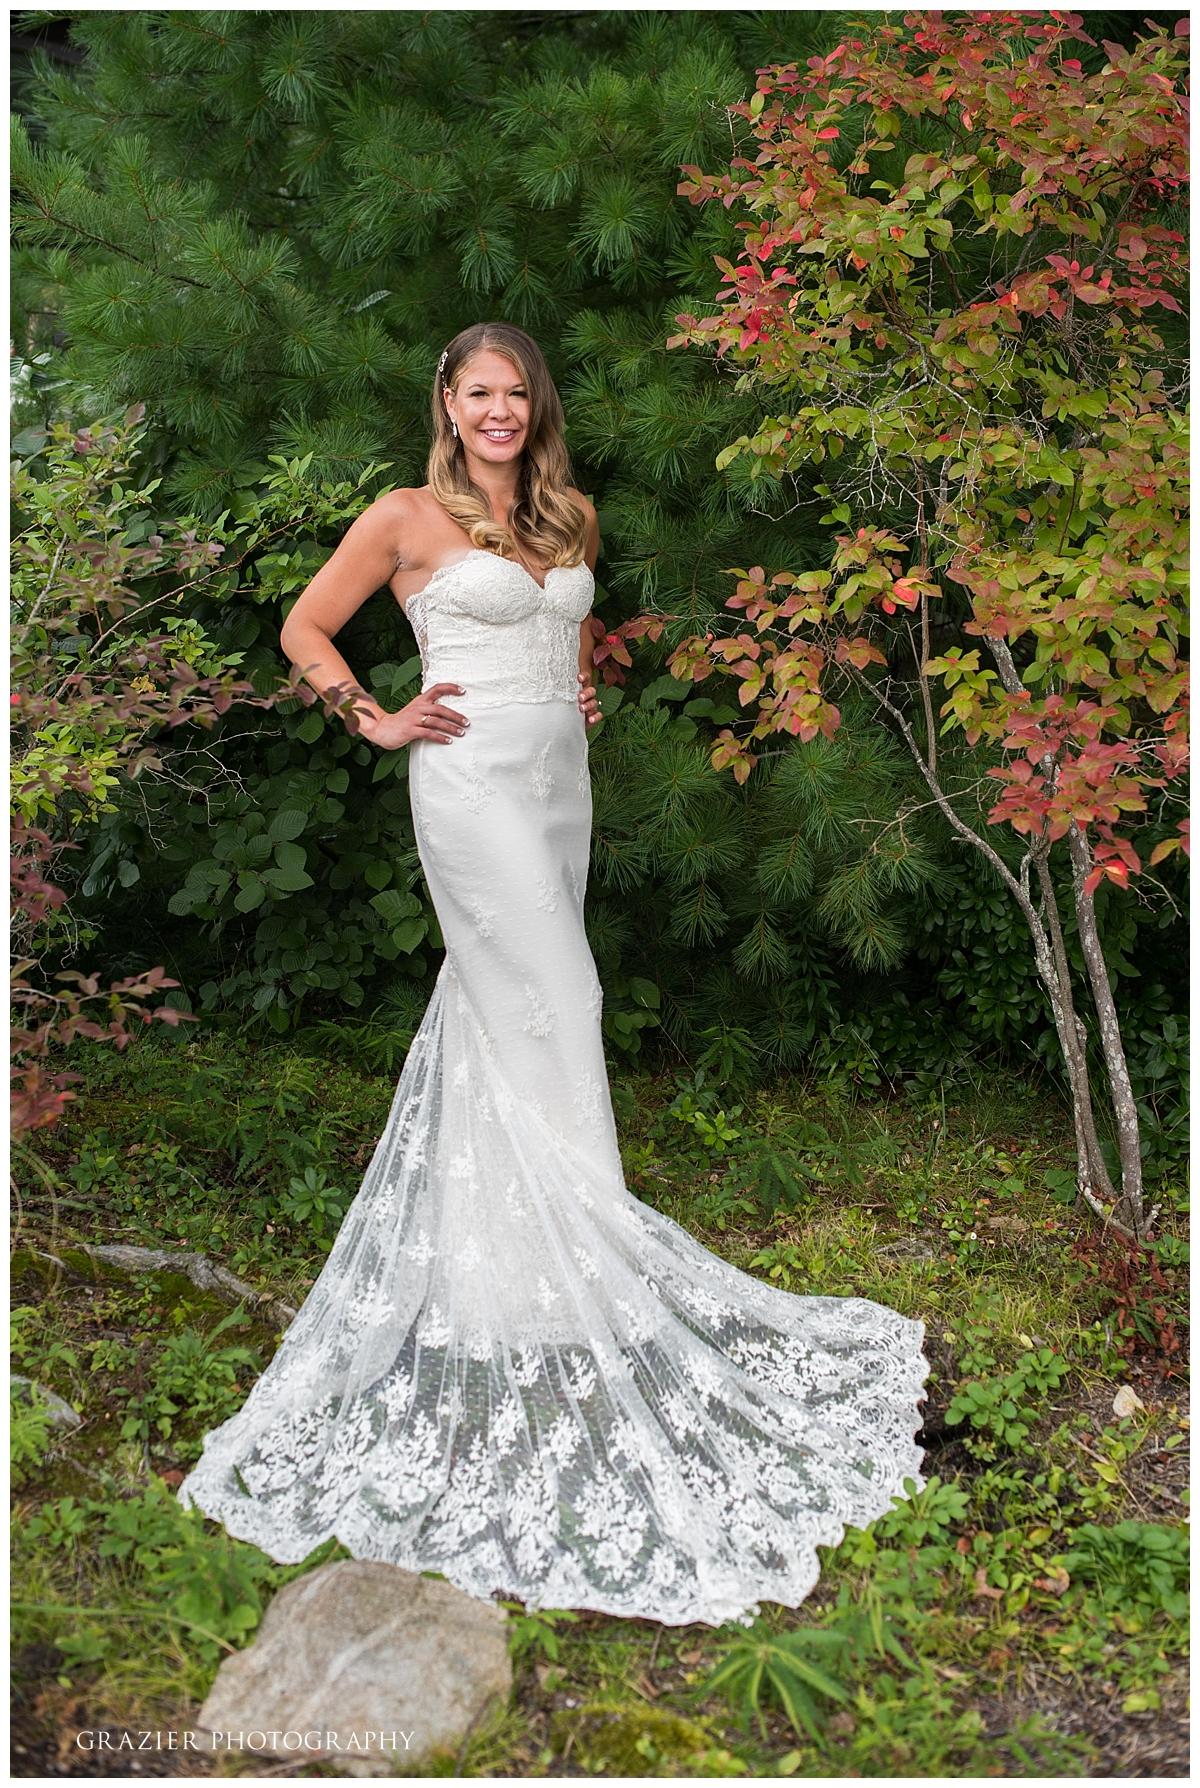 New Hampshire Lake Wedding Grazier Photography 170909-142_WEB.jpg